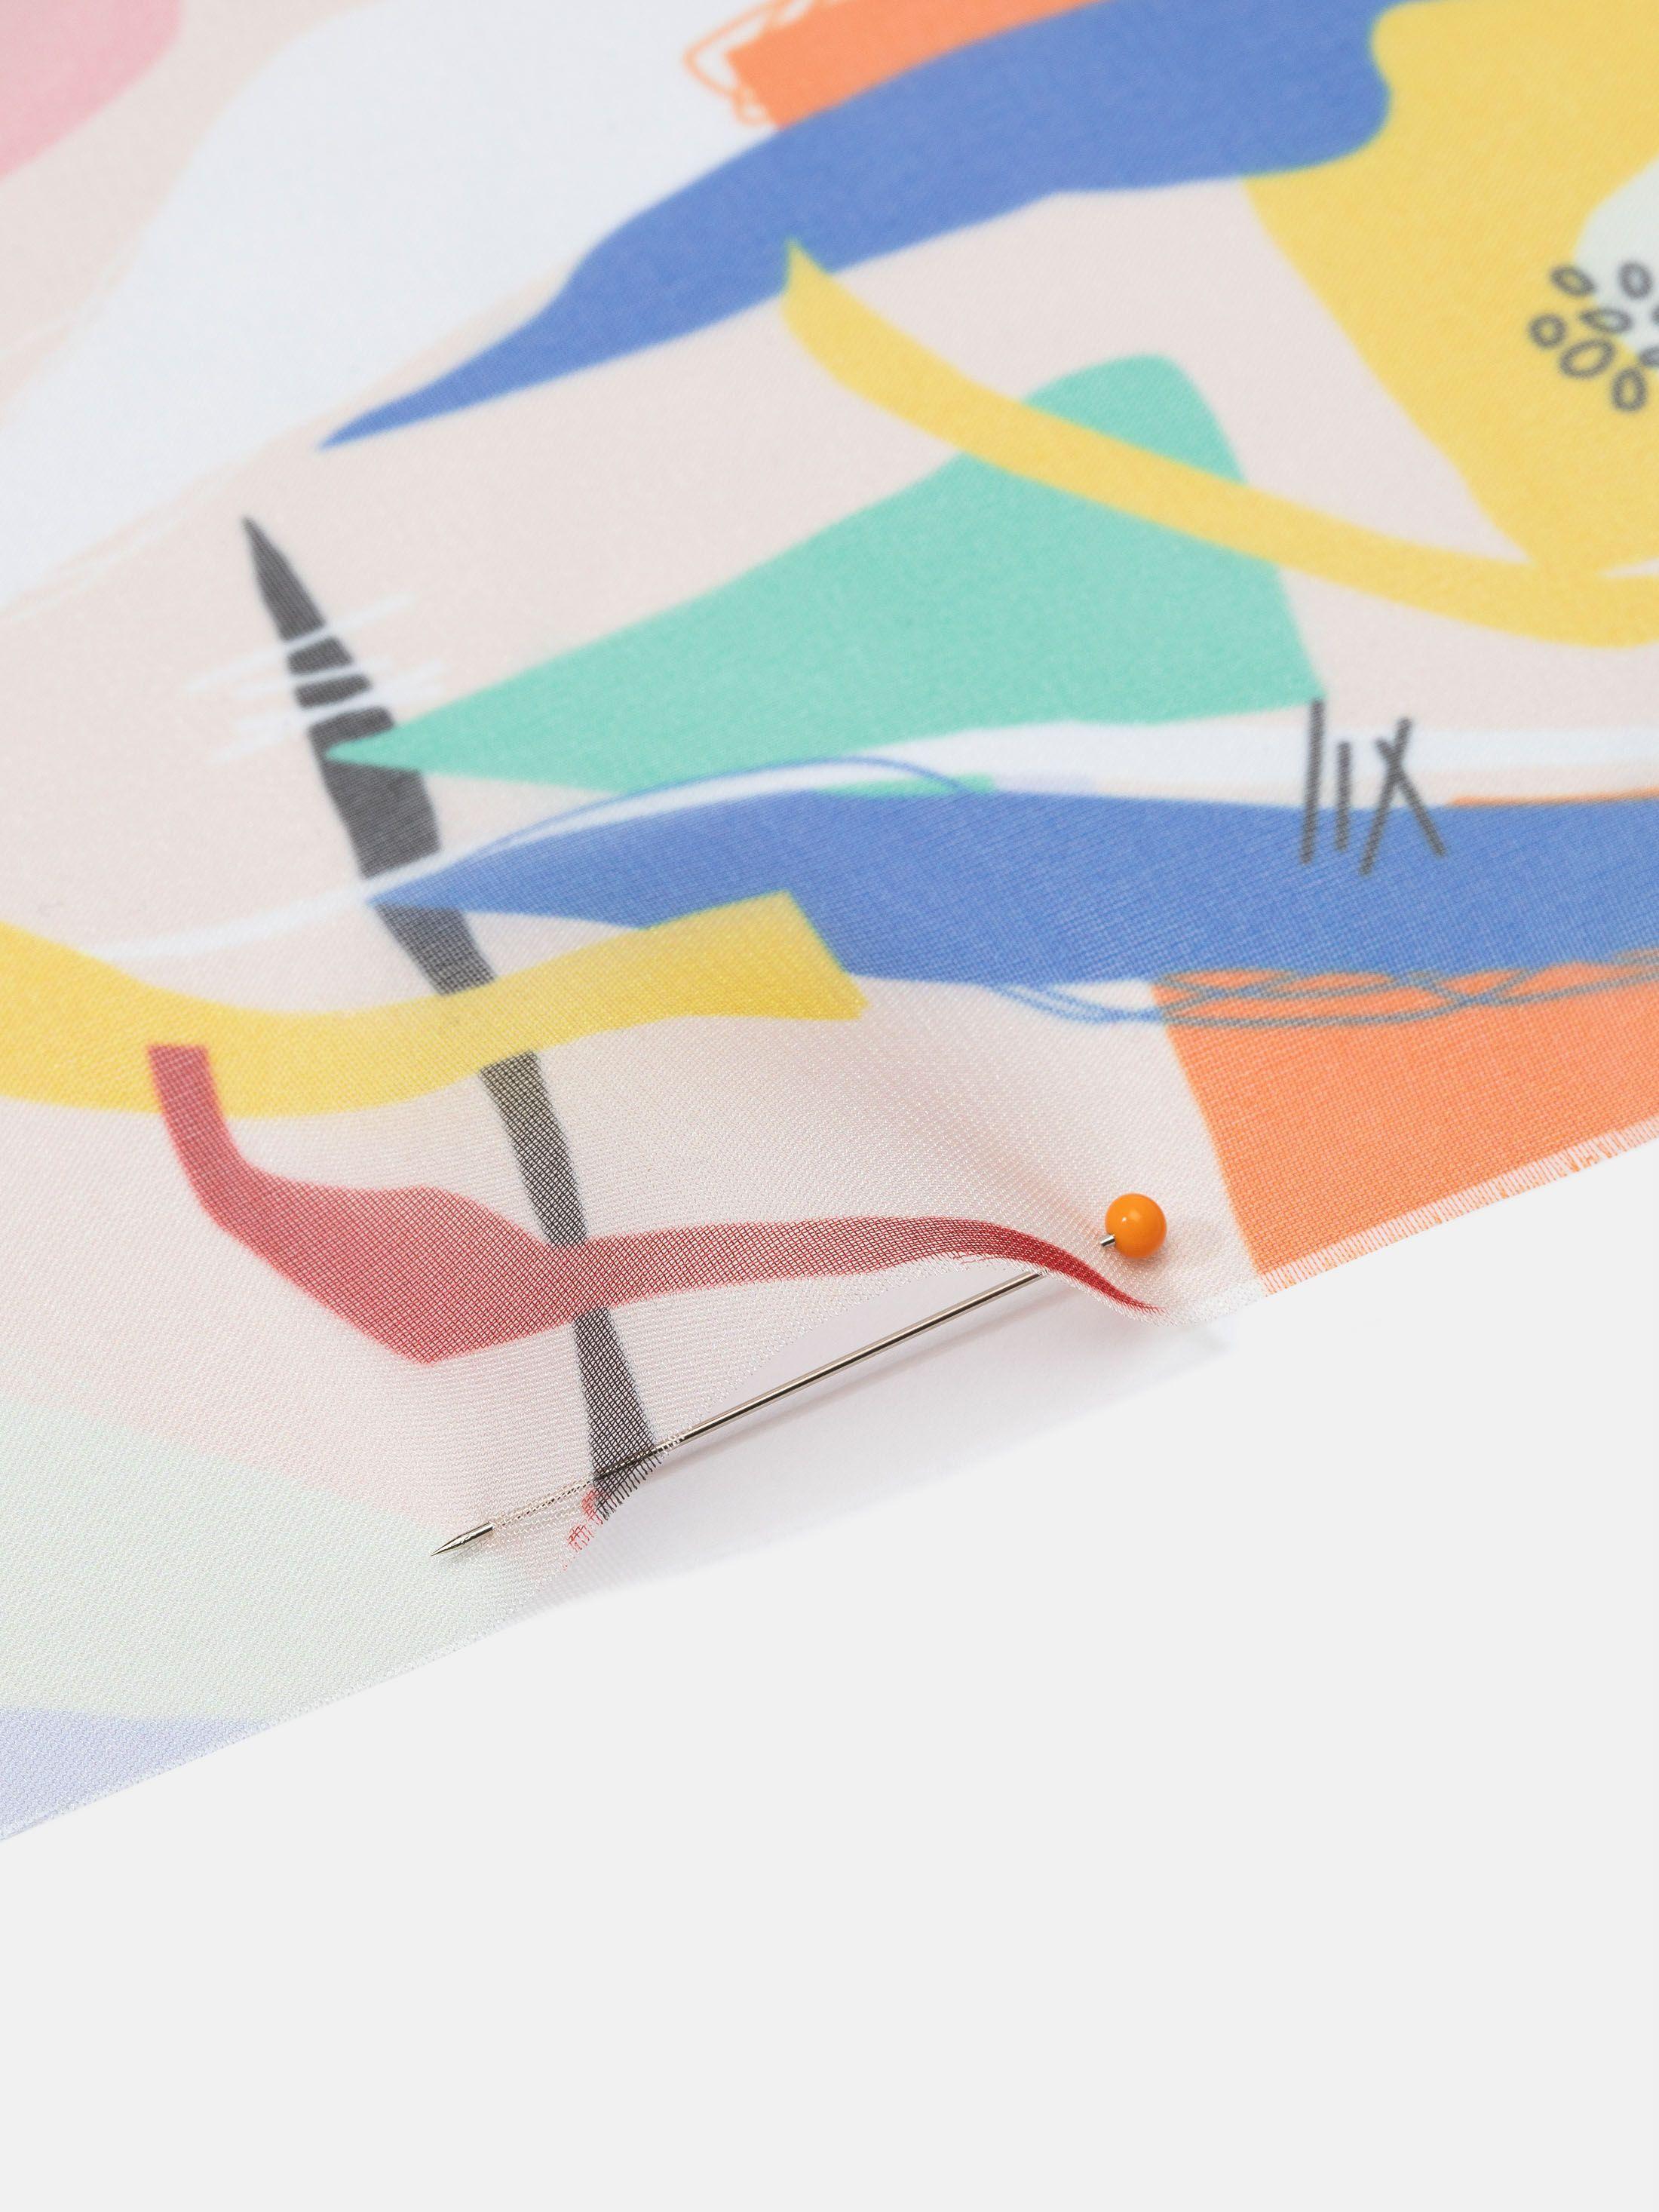 Paris Chiffon digital print fabric